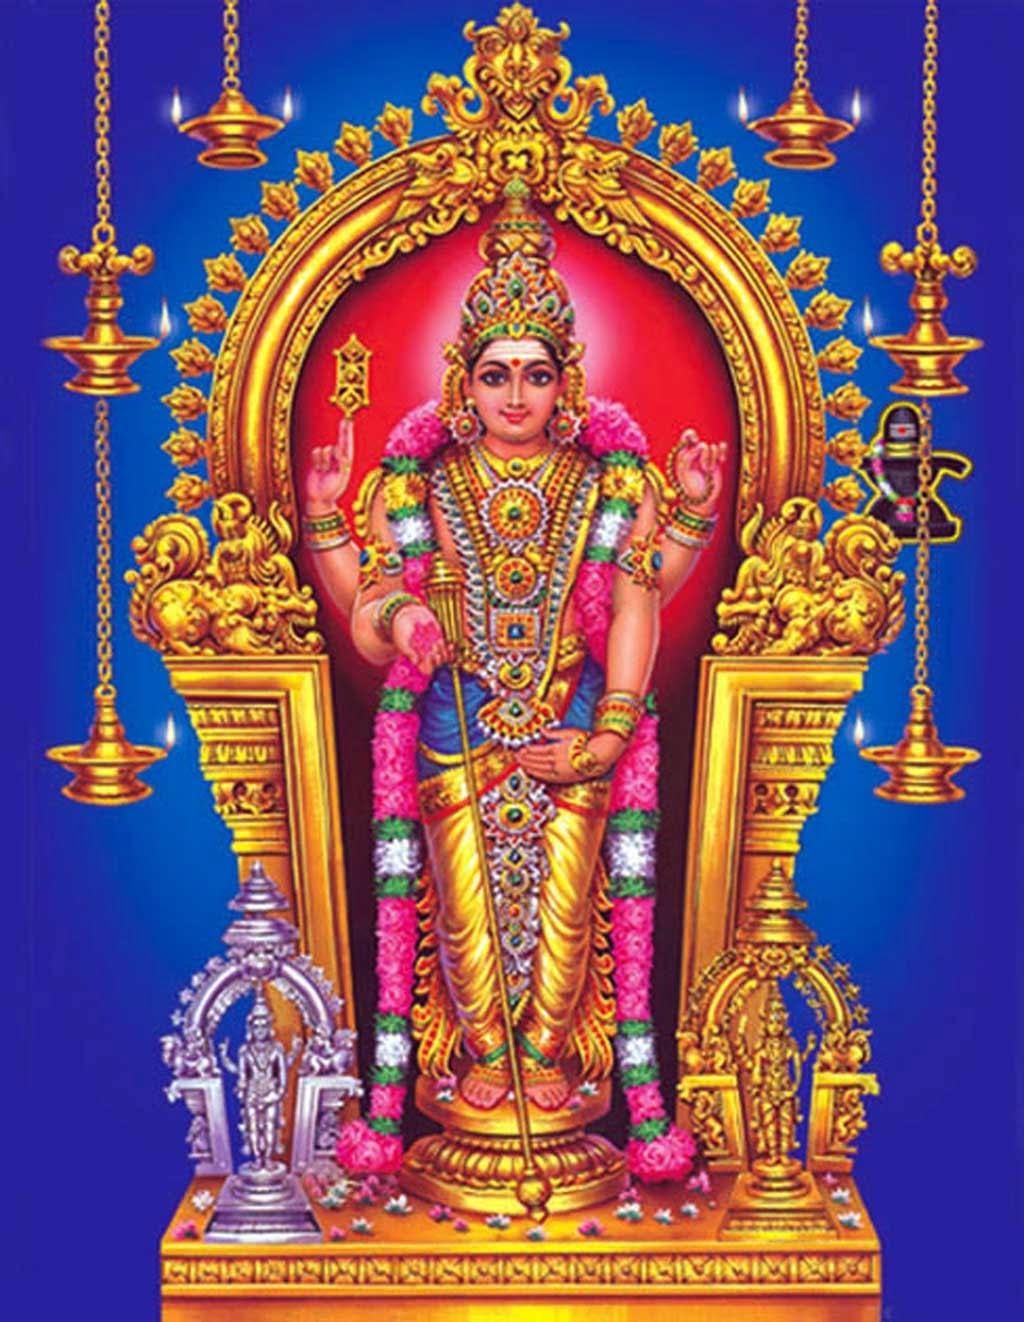 Lord murugan temple wallpapers hd images pictures photos gallery lord murugan temple wallpapers hd images pictures photos gallery free download hindu god image hindugodimagesspot thecheapjerseys Image collections